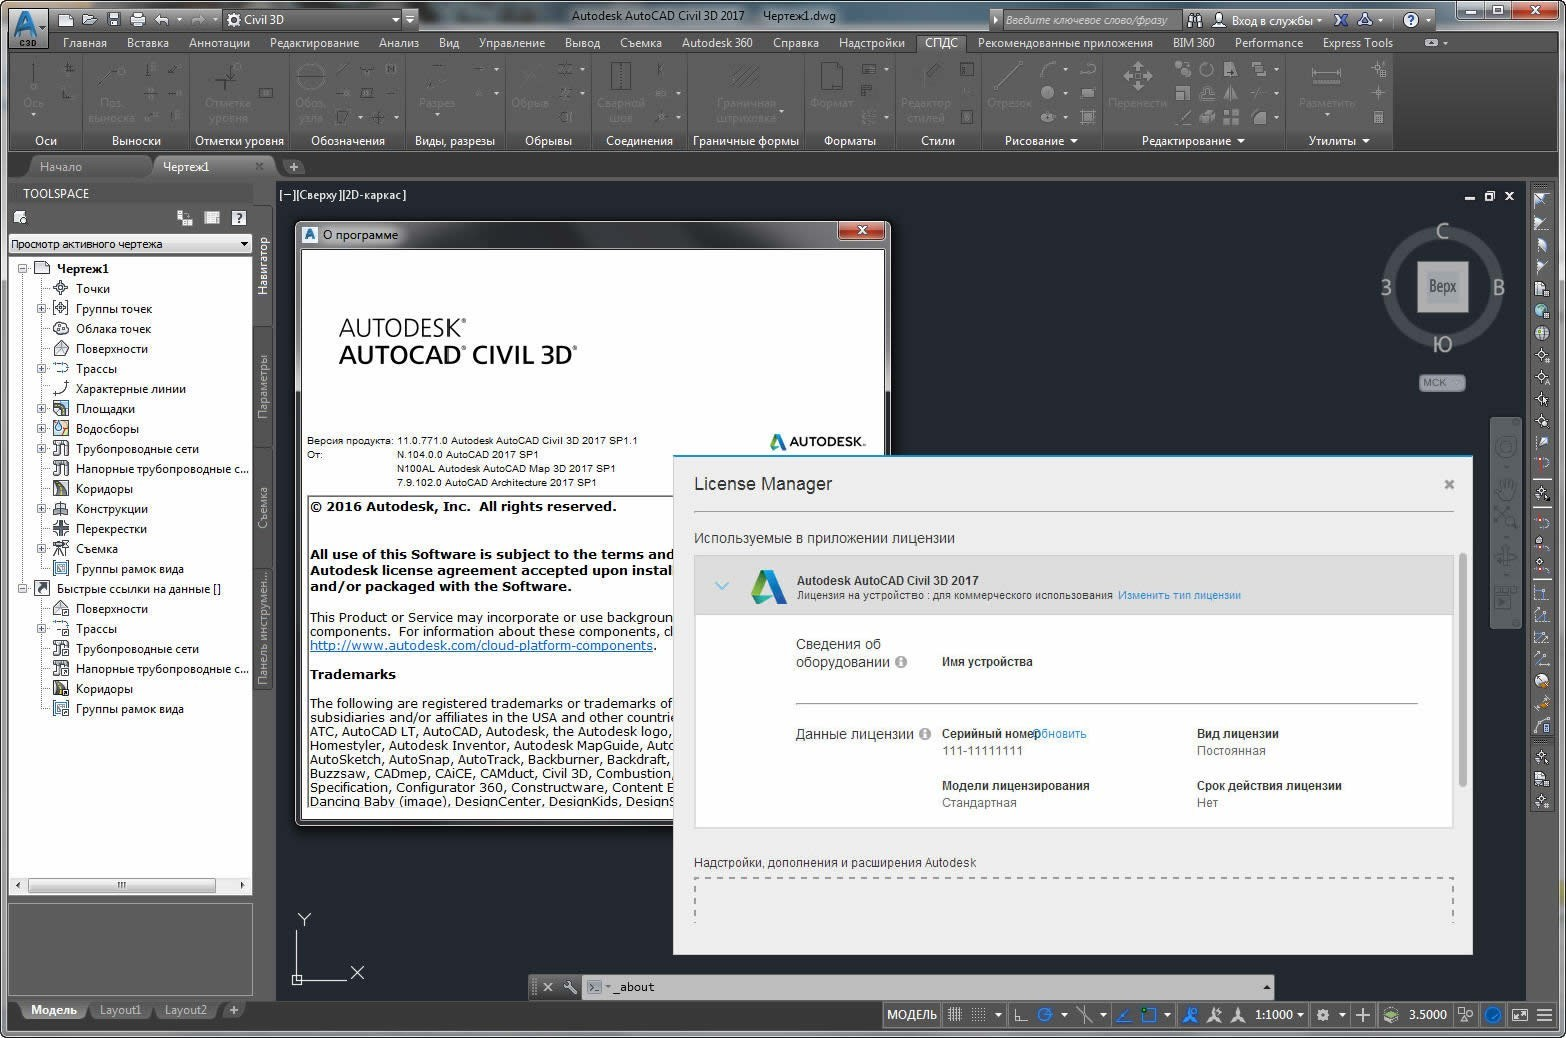 Interface of Autodesk AutoCAD Civil 3D 2017 SP1.1 64bit full license